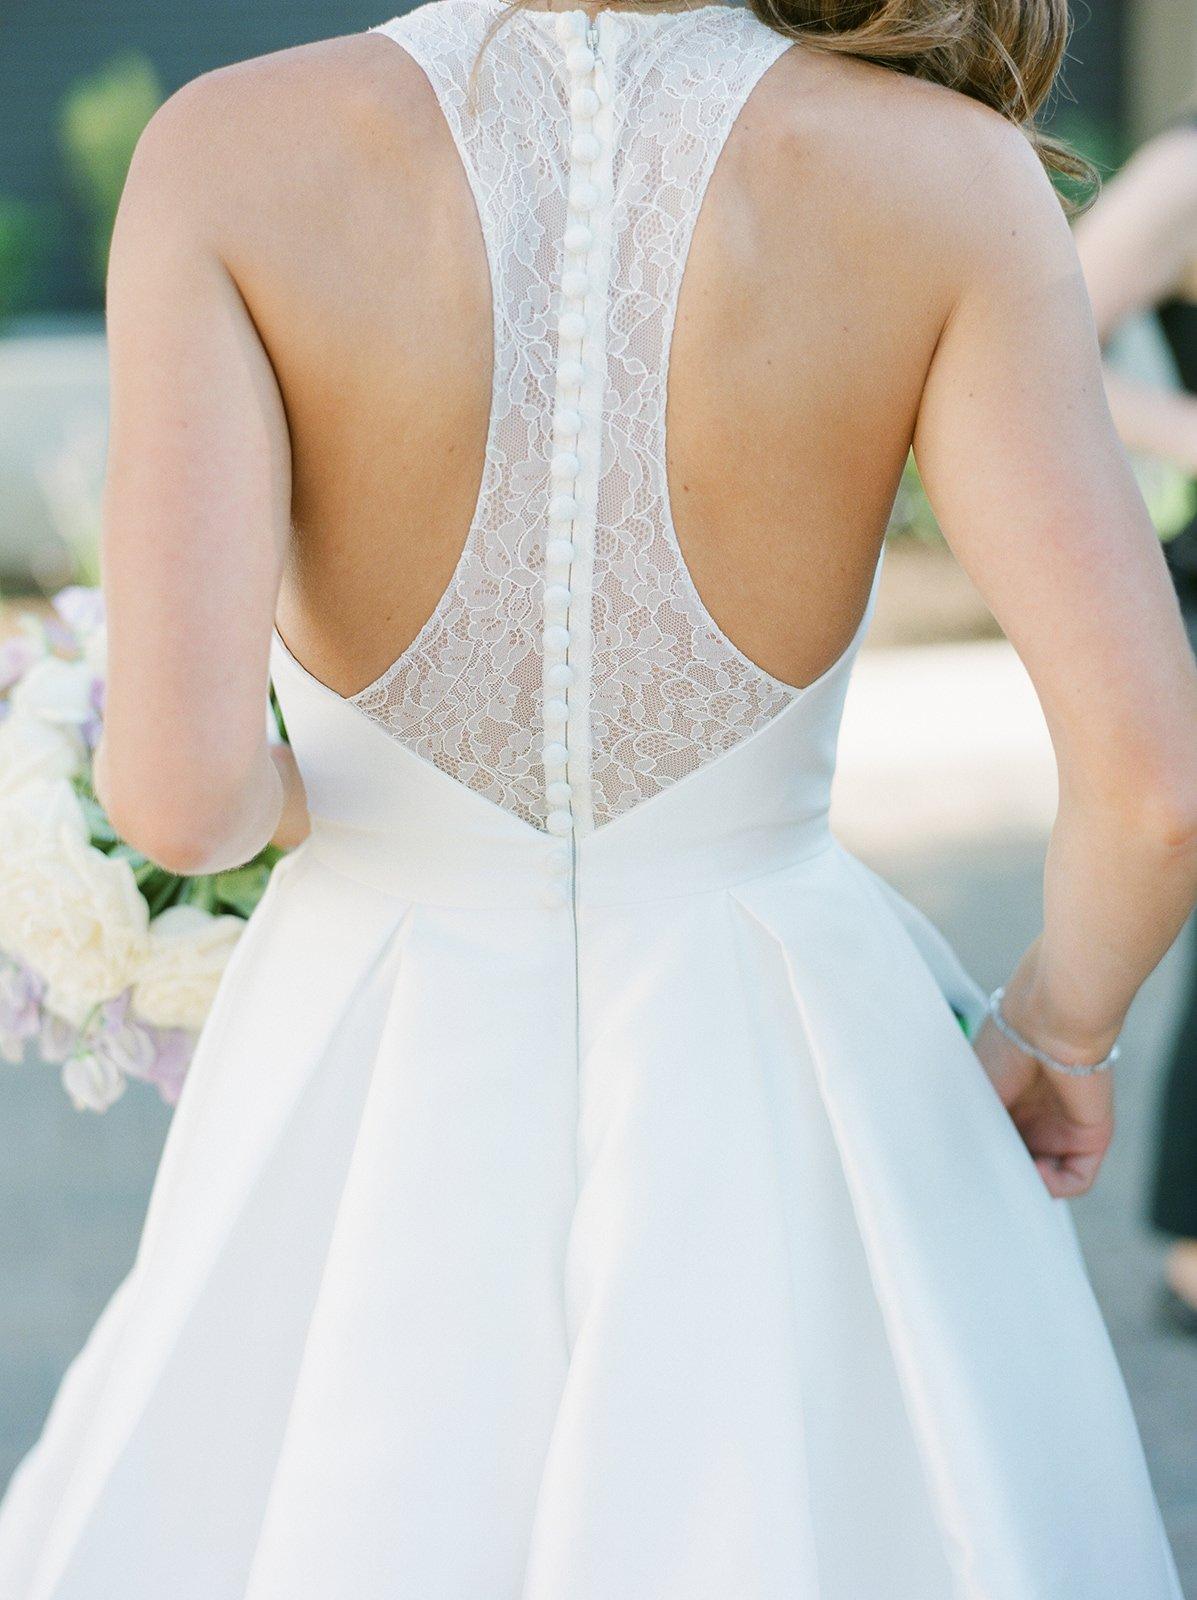 Lace Racerback Detail,Best Spanx For Wedding Dress Plus Size